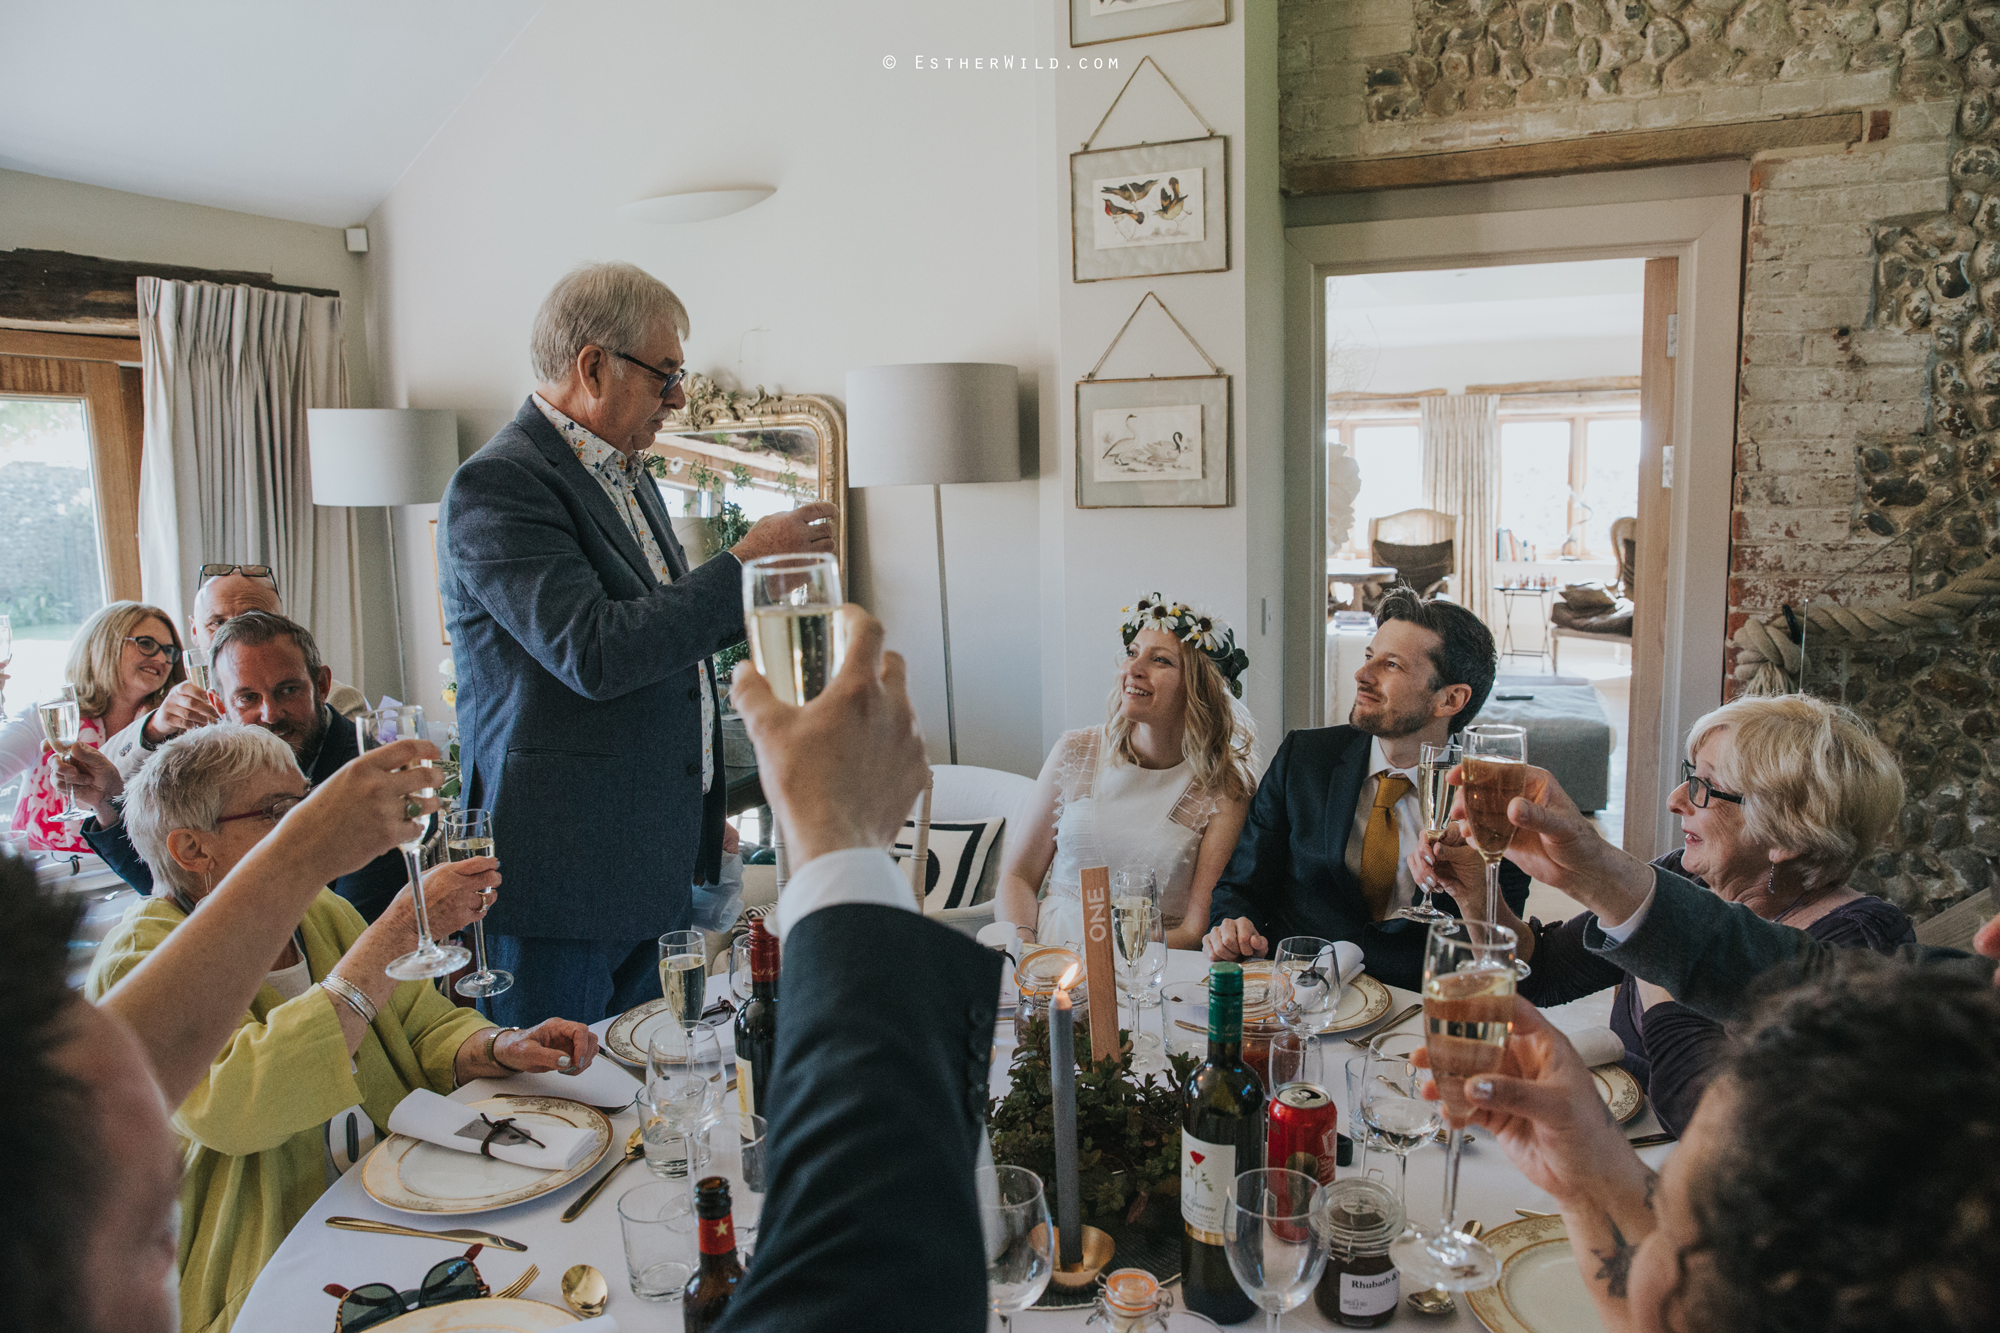 IMG_1730Cley_Barn_Drift_Norfolk_Coast_Wedding_Copyright_Esther_Wild_Photographer_.jpg